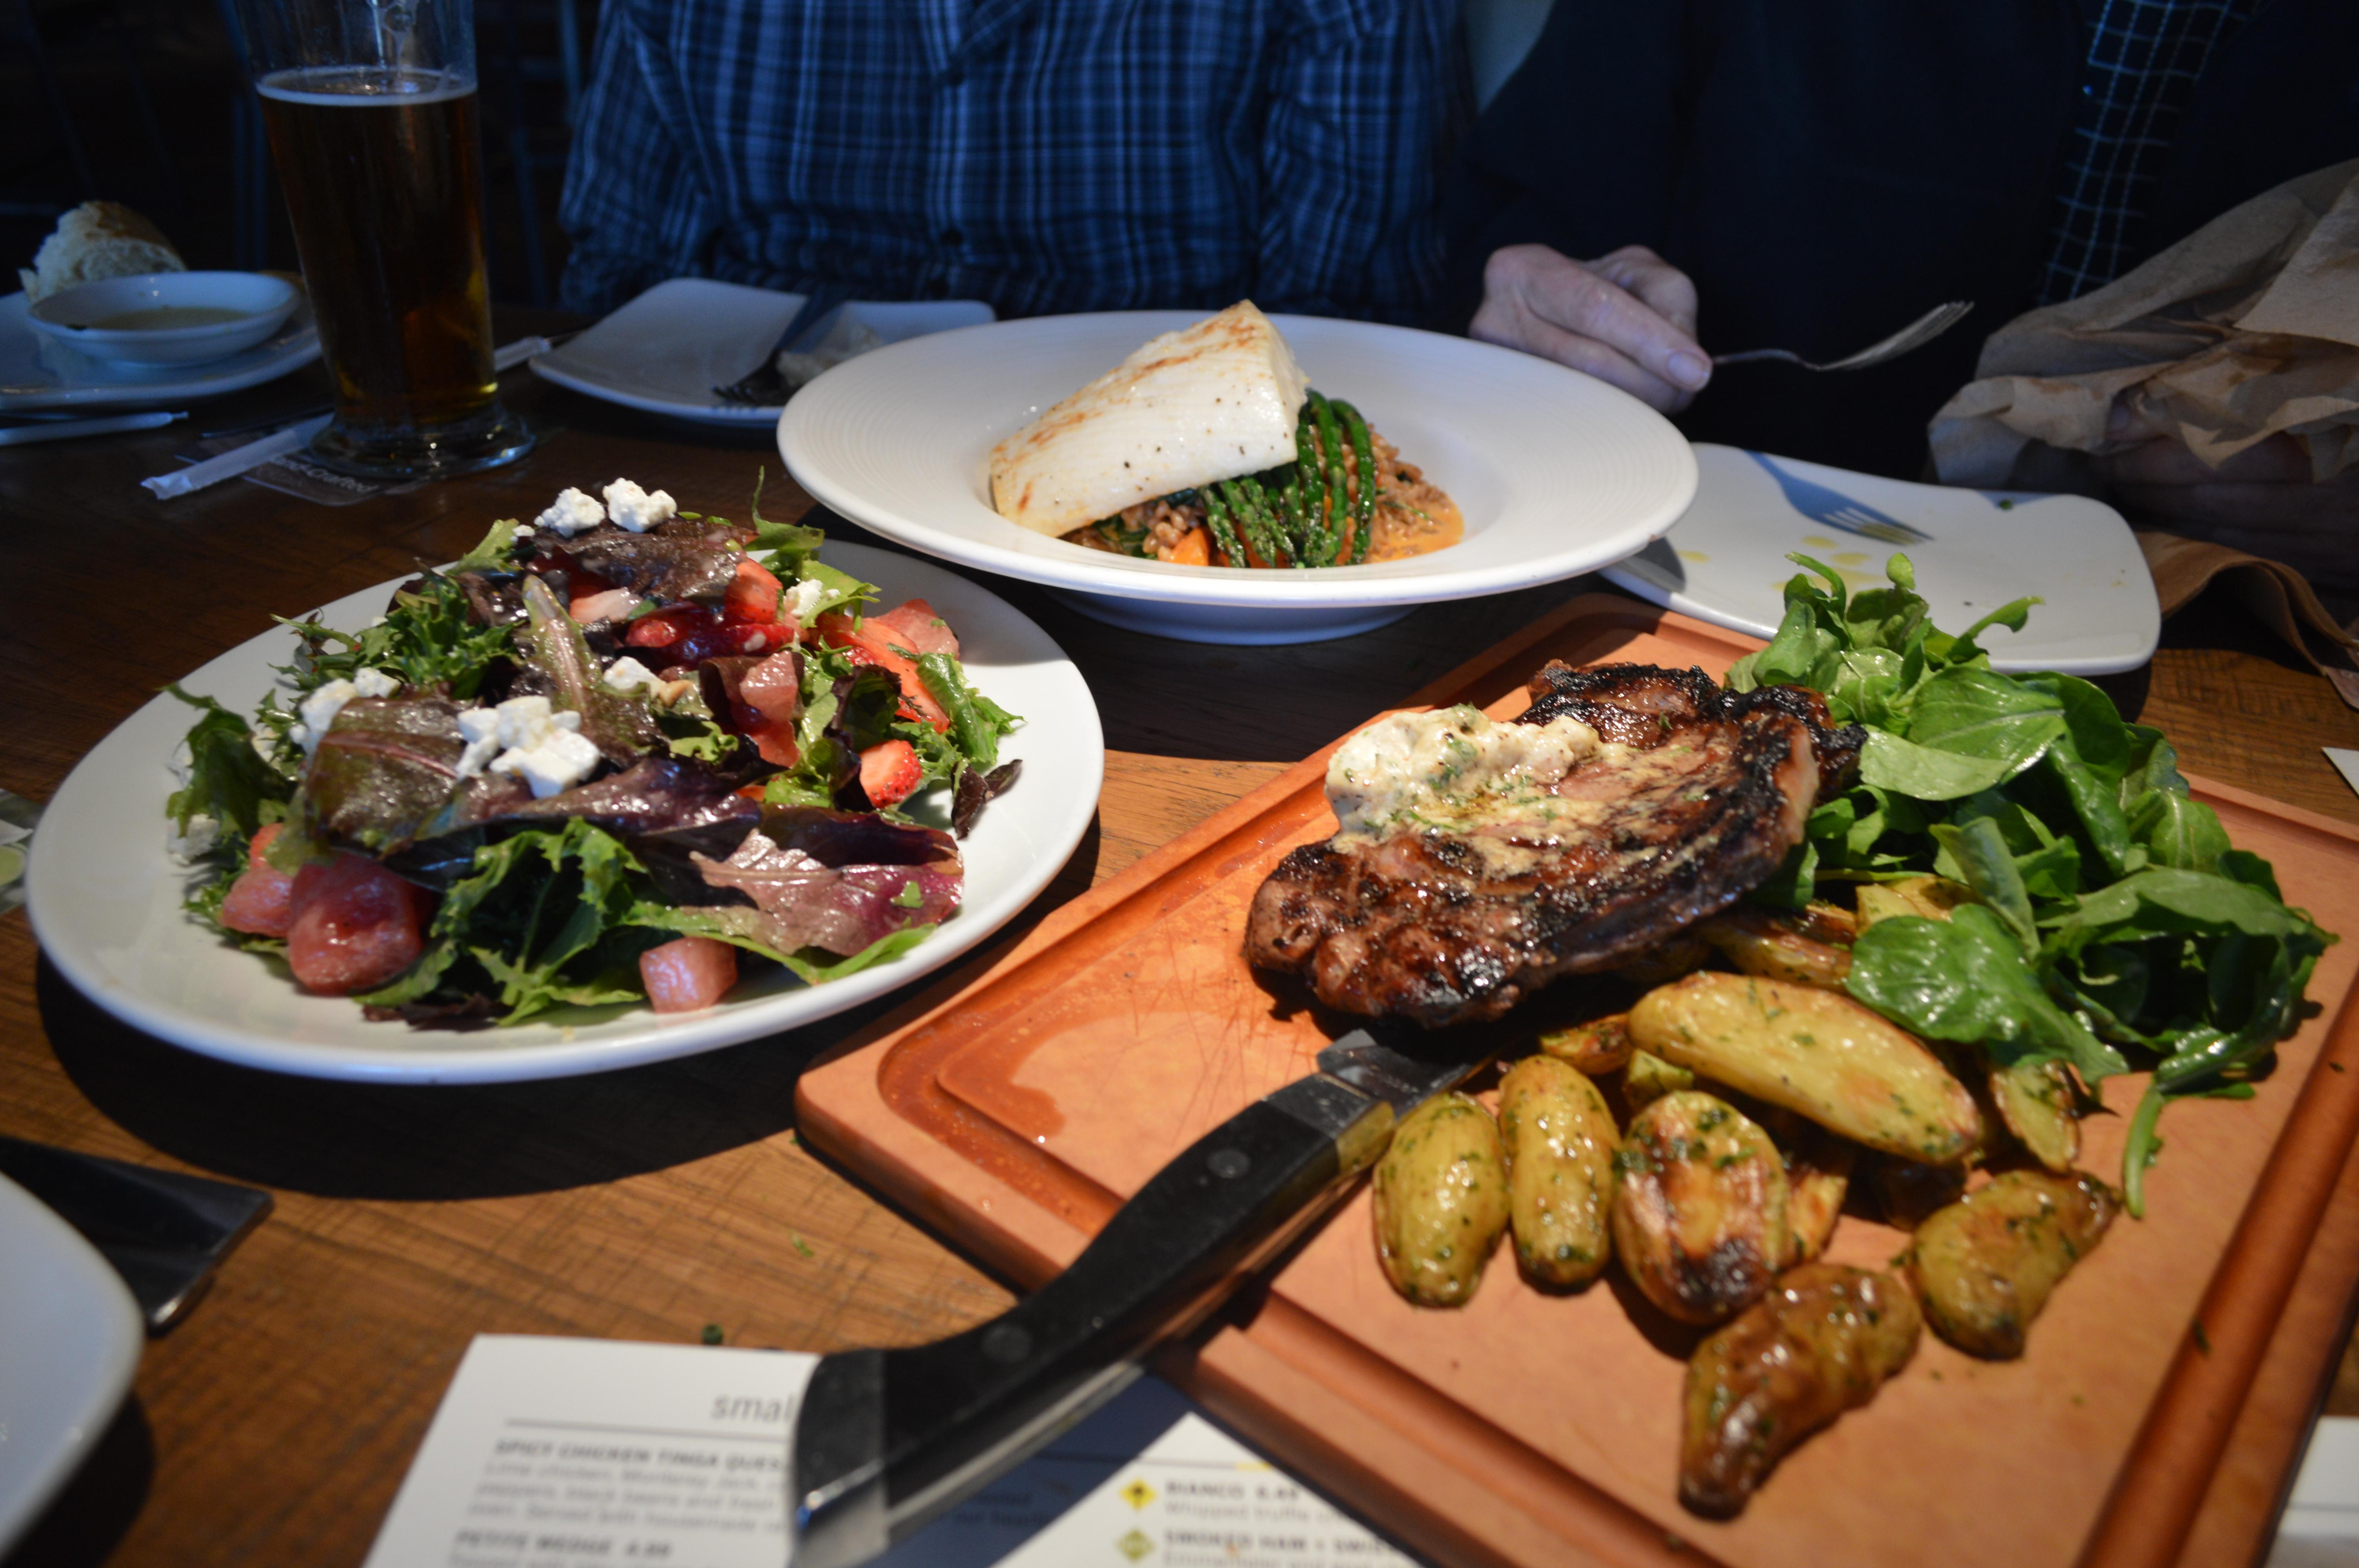 Dsc Boardwalk Pasta And Seafood Menu